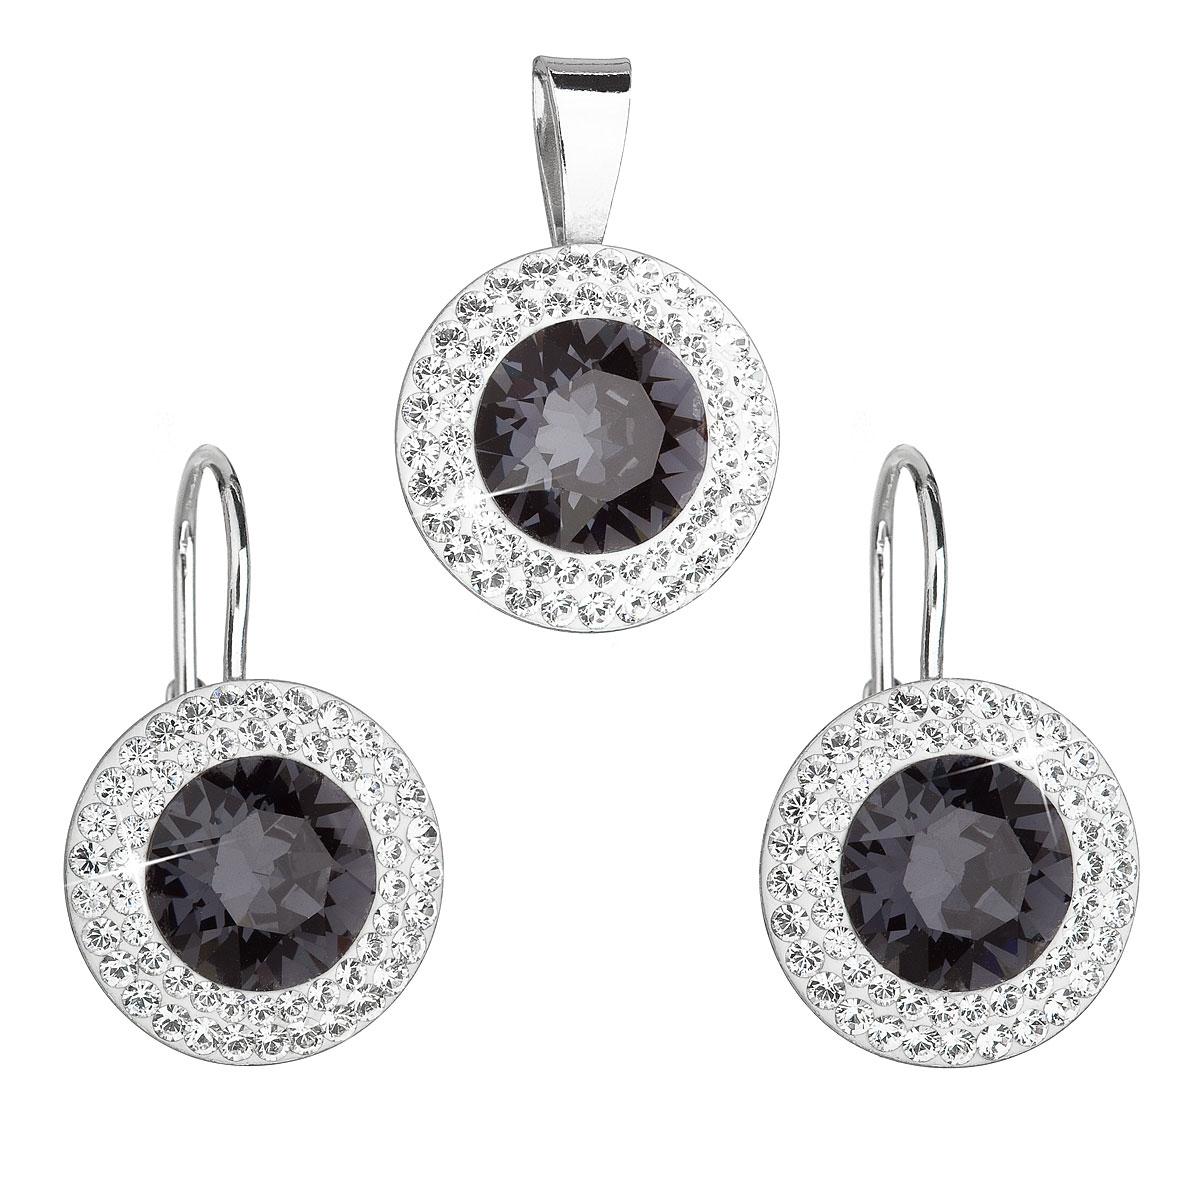 Stříbrná spouprava šperků Crystals from Swarovski® Grey